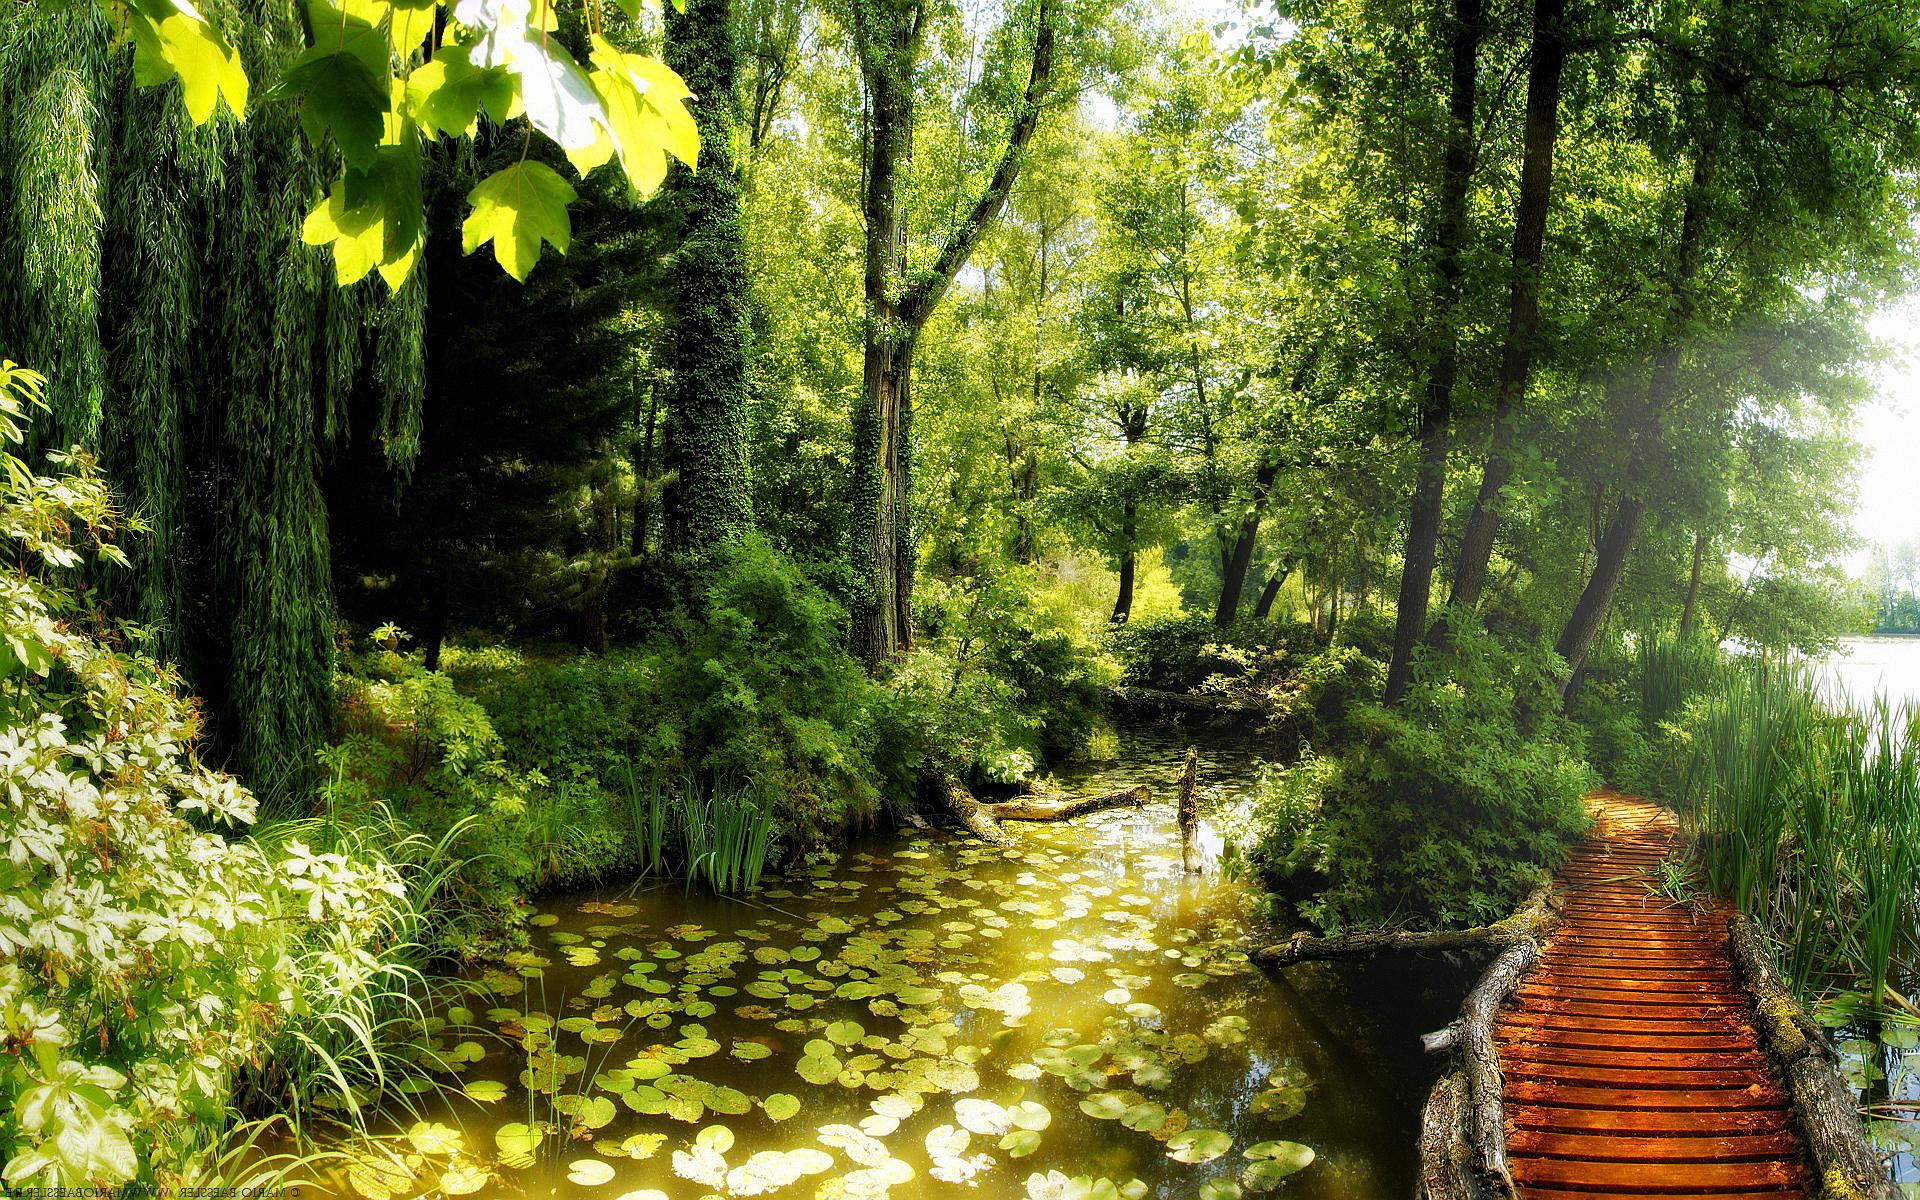 deep forest wallpaper path - HD Desktop Wallpapers | 4k HD